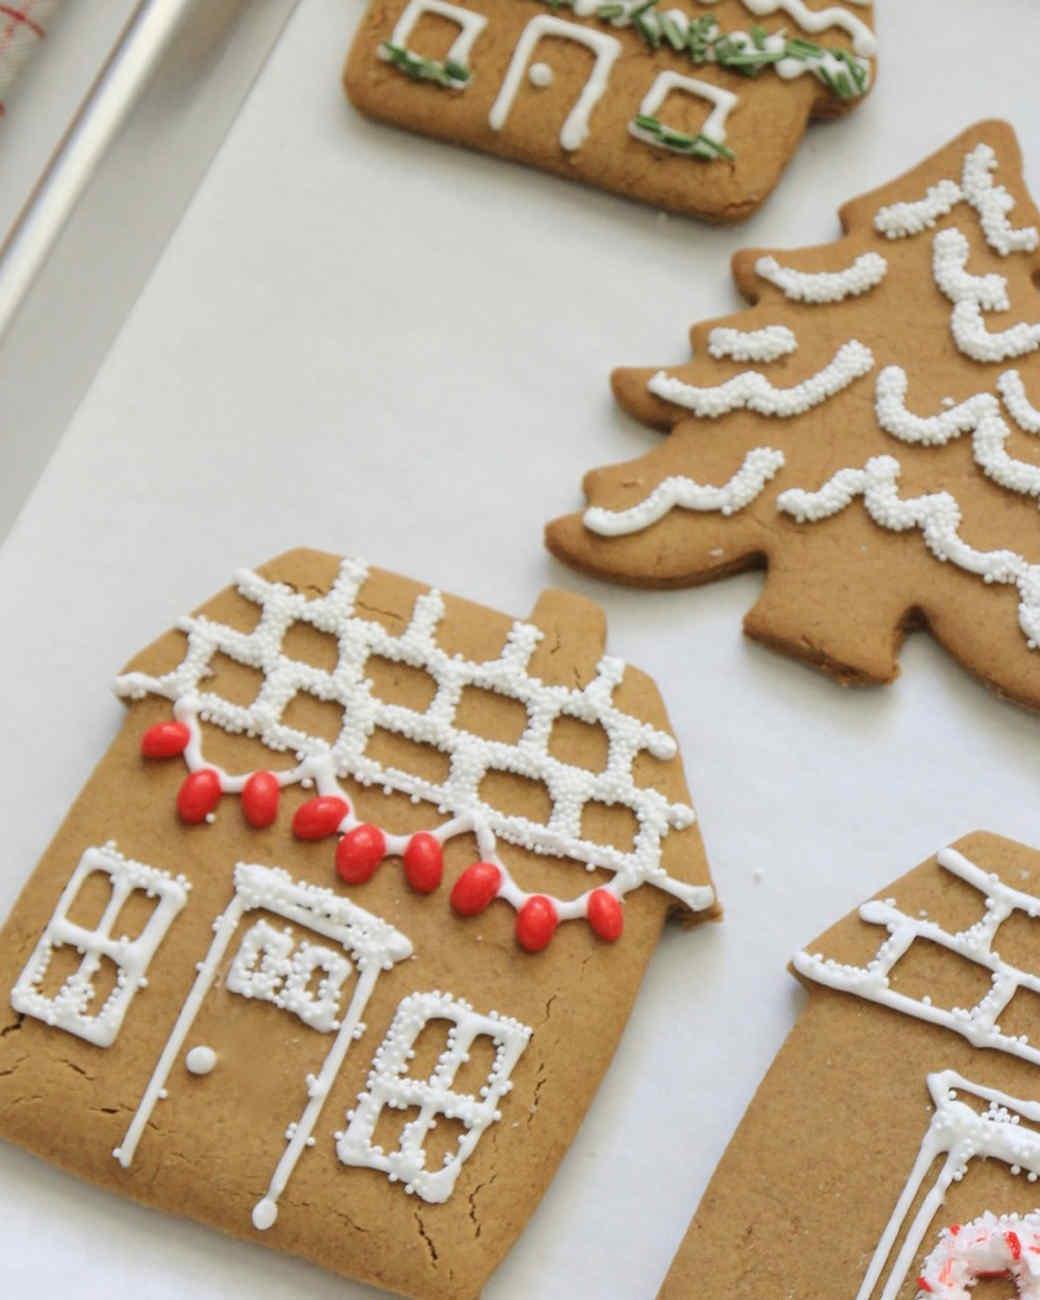 gingerbread-house-mini-jennysteffens-1115.jpg